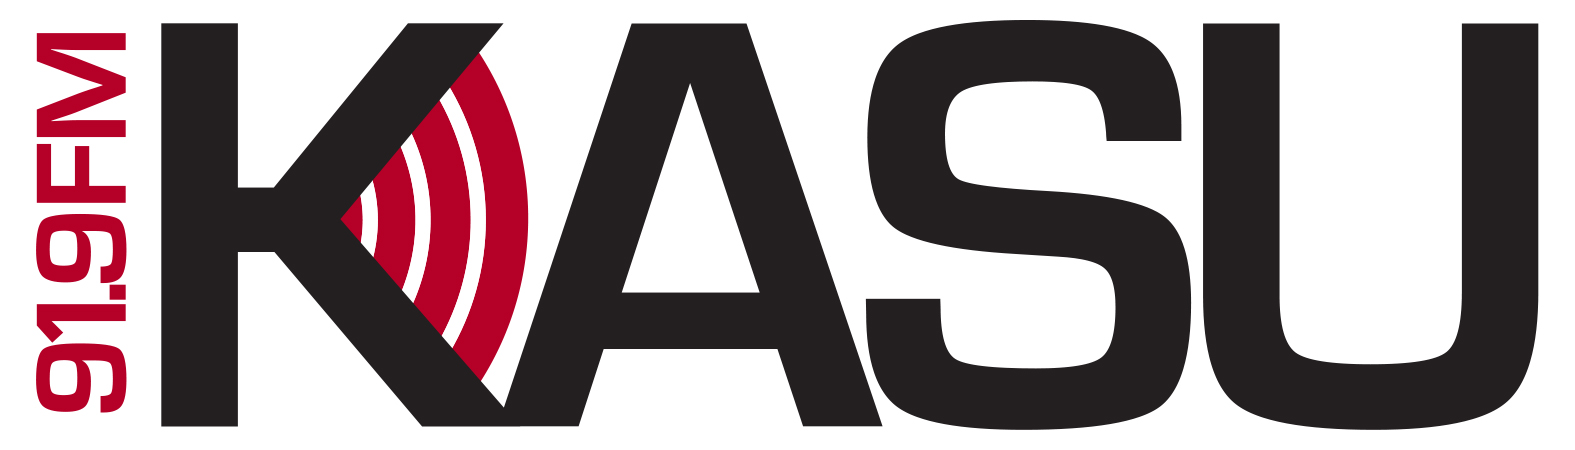 KASU-logo-new